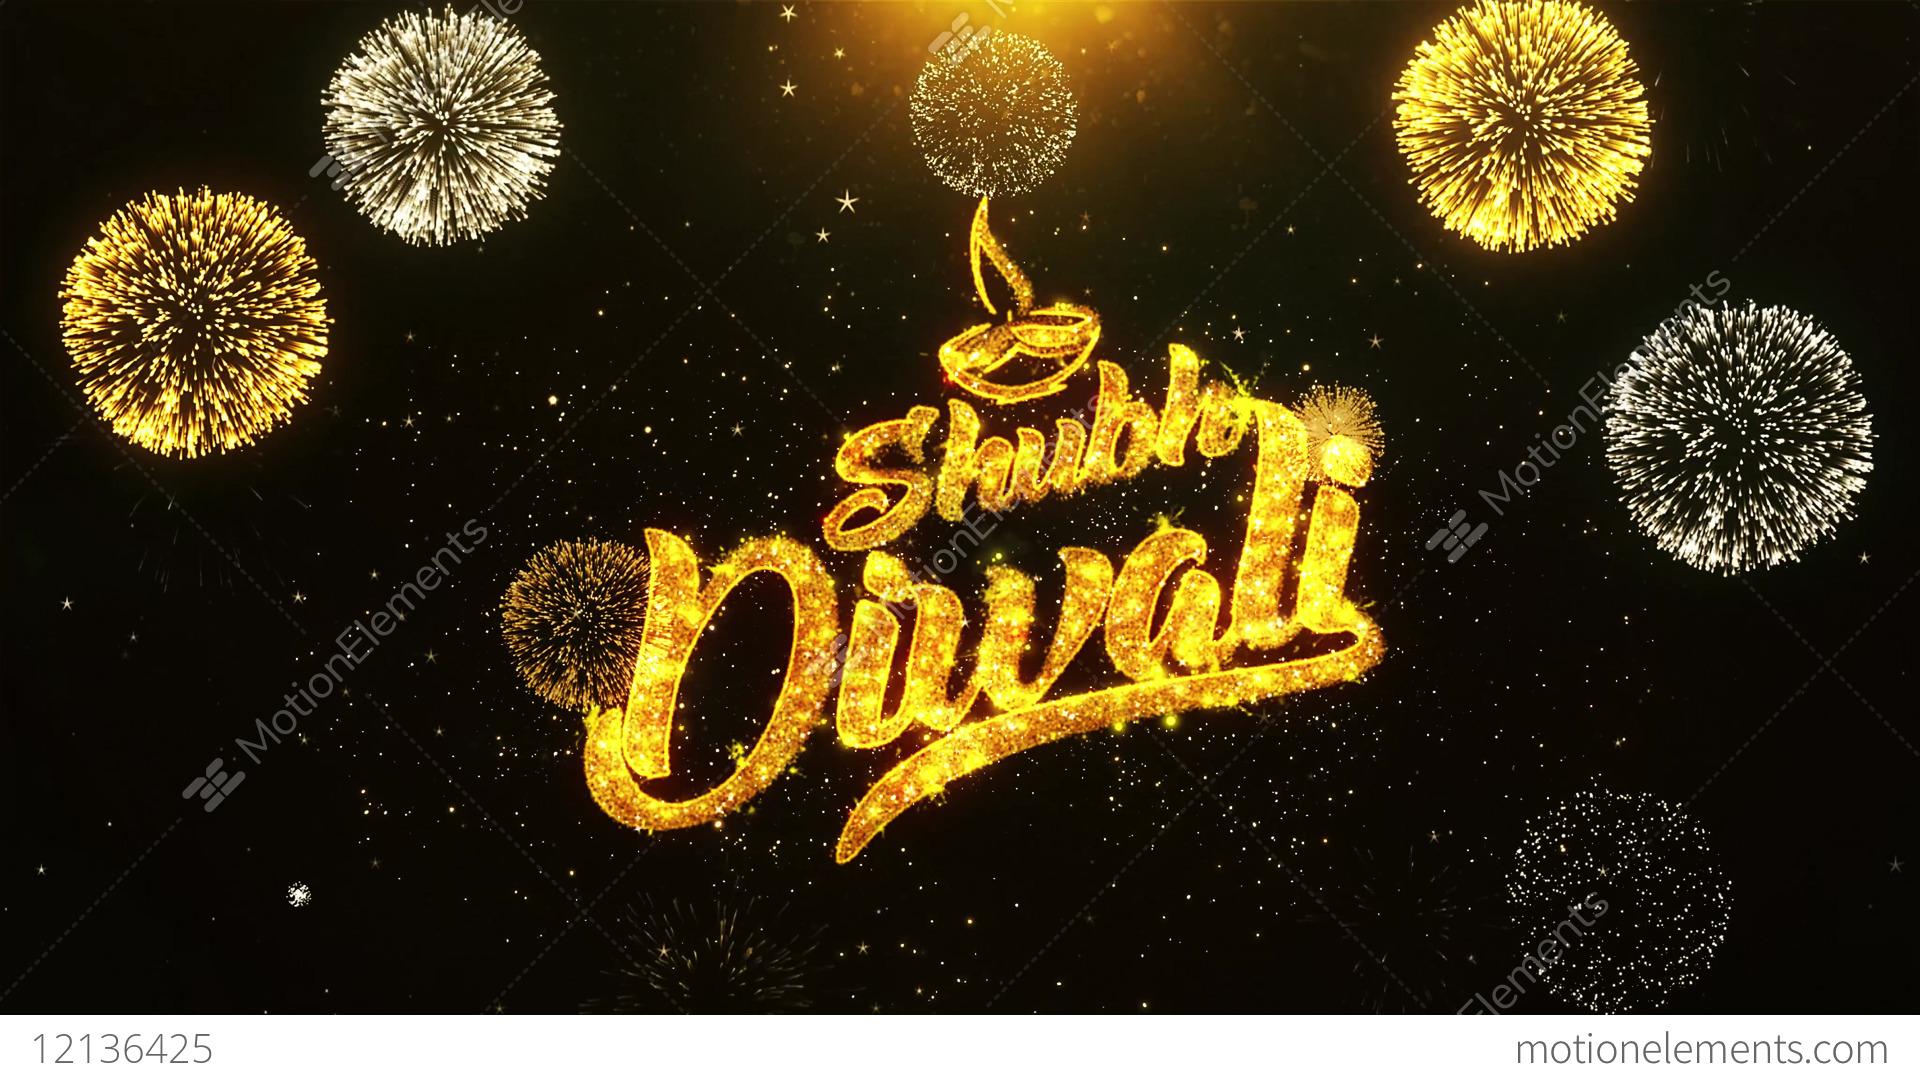 Happy Diwali Dipawali Text Greeting Wishes Celebration Invitation